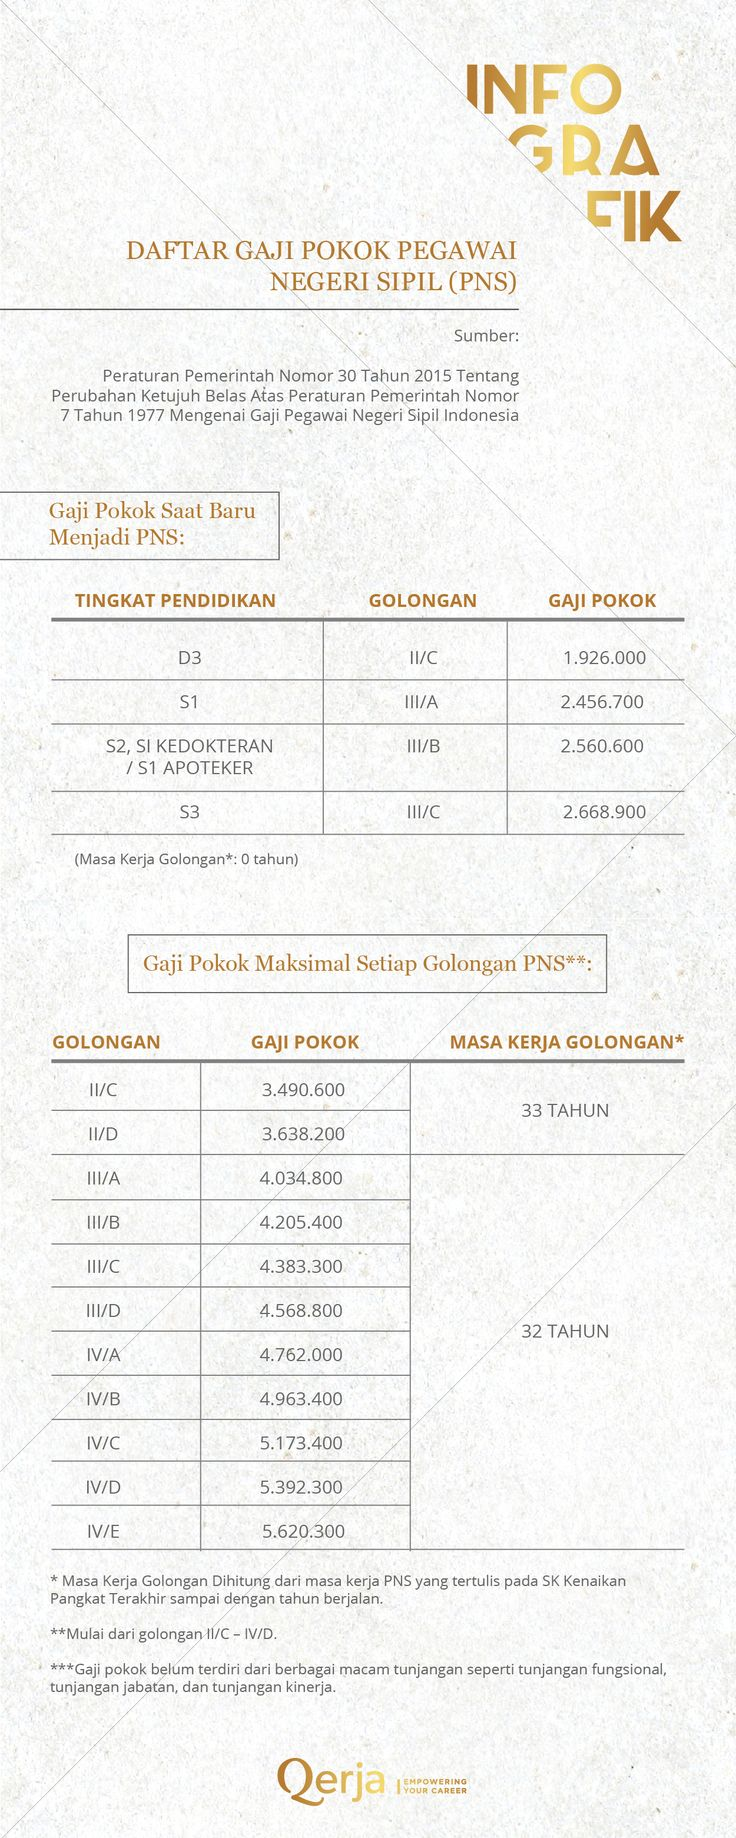 #infographic #infografik #gaji #ratarata #average  #pns #indonesia #qerja